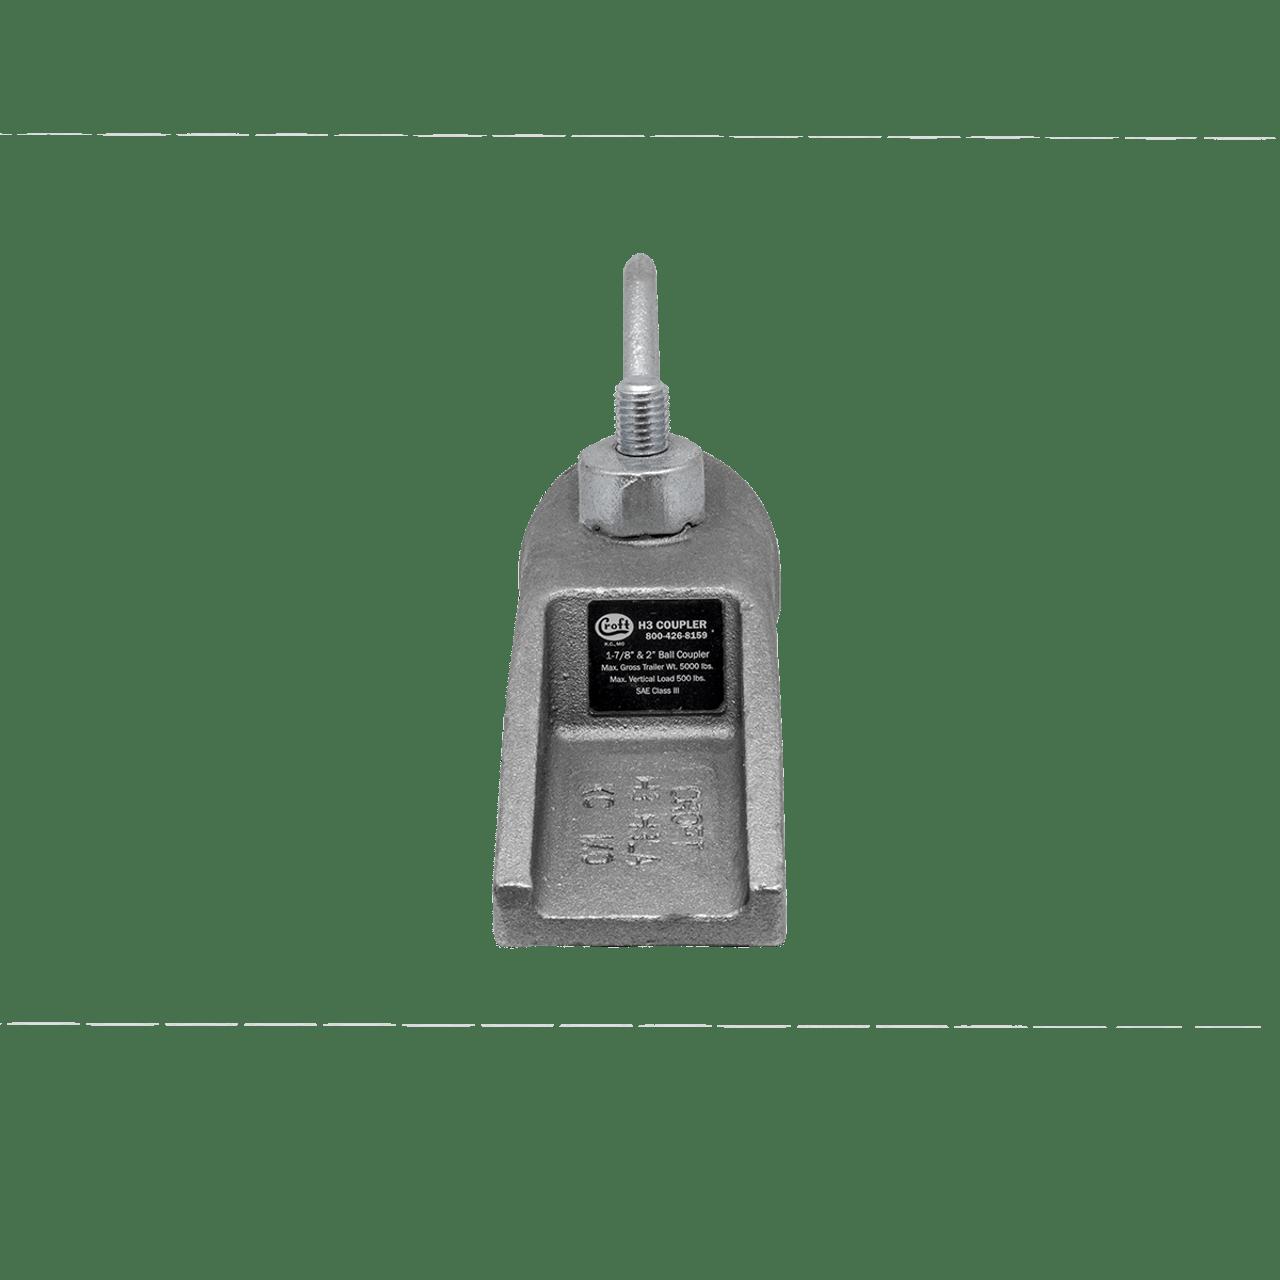 "H-3 --- CROFT Coupler with N-3 Loop Nut - 5,000 lb Capacity - 1-7/8 or 2"""